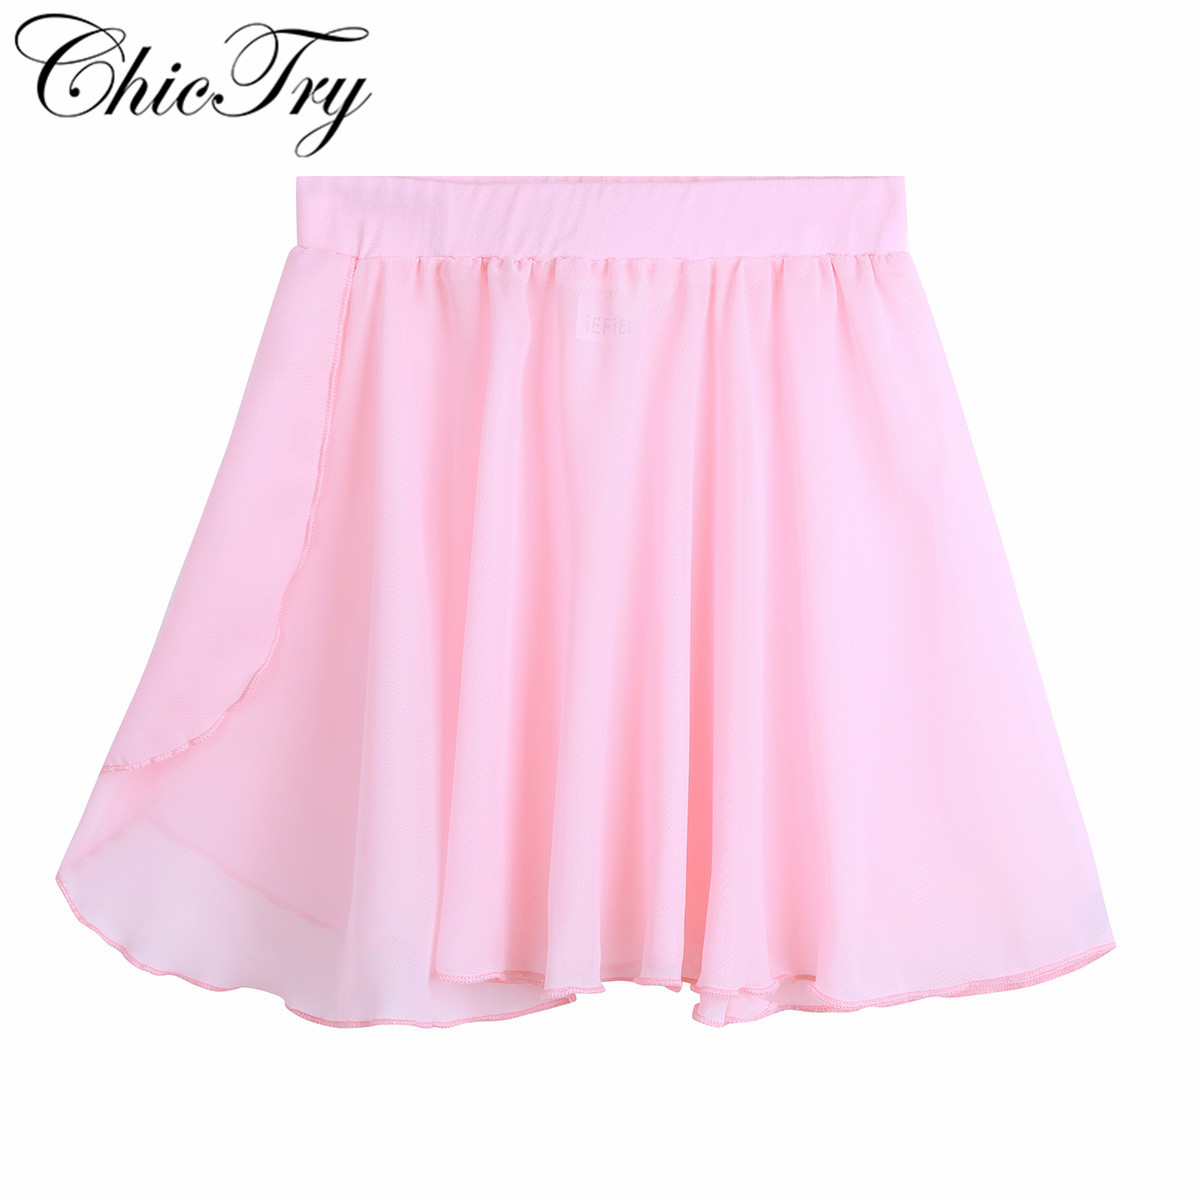 ChicTry Kids Girls Ballet Dance Basic Classic Chiffon Mini Wrap Skirt Costume For Stage Performance Dancing Wear Gymnastics Wear